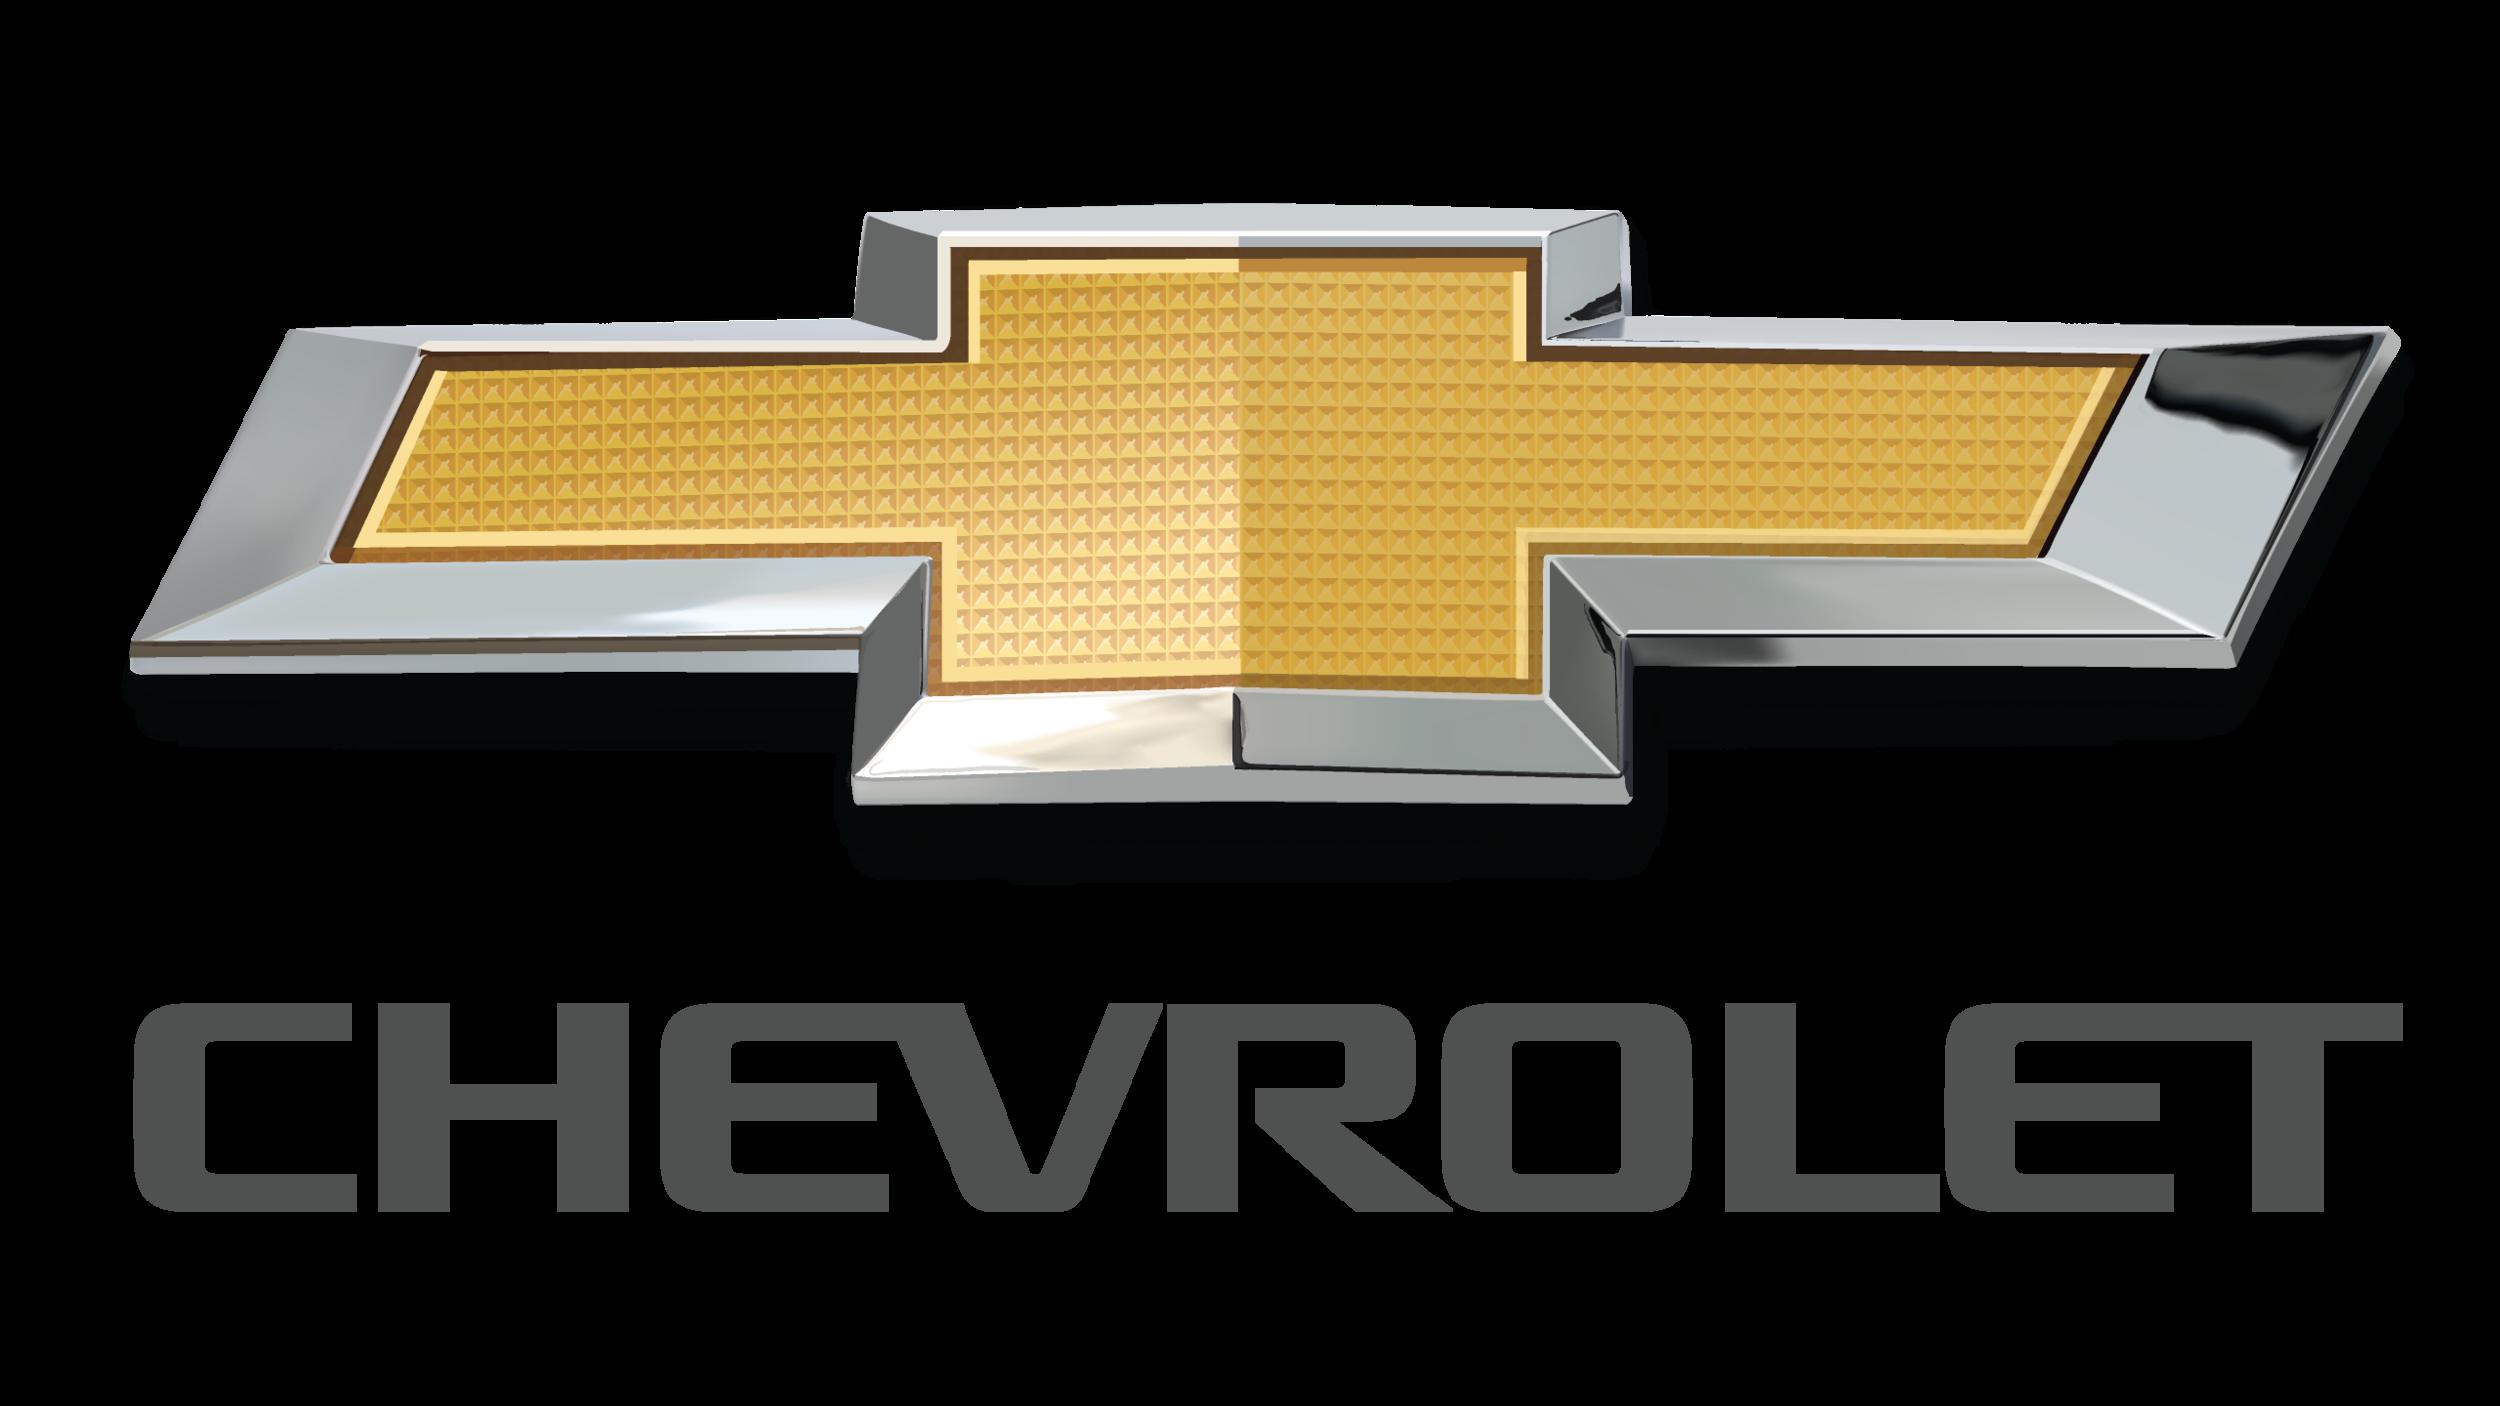 chevrolet logo.png